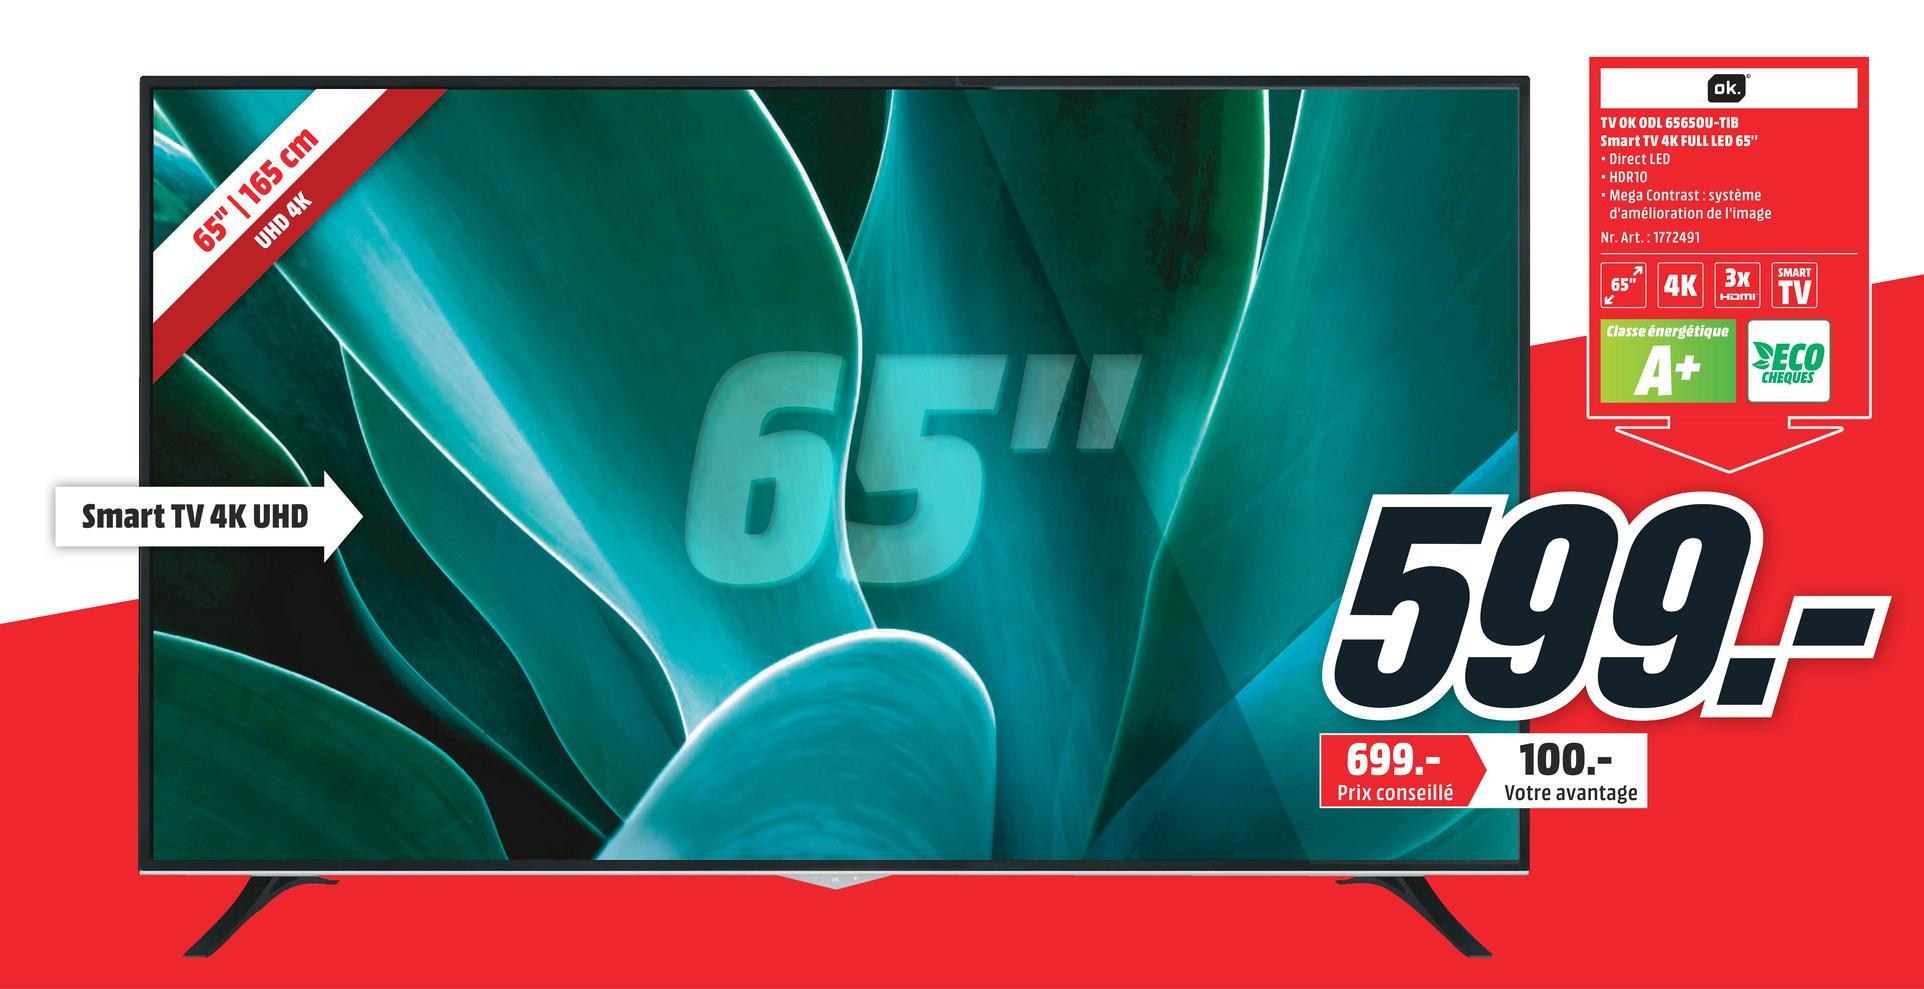 TV OK ODL 65650U-TIB 65'' FULL LED Smart 4K TV OK ODL 65650U-TIB 65'' FULL LED Smart 4K